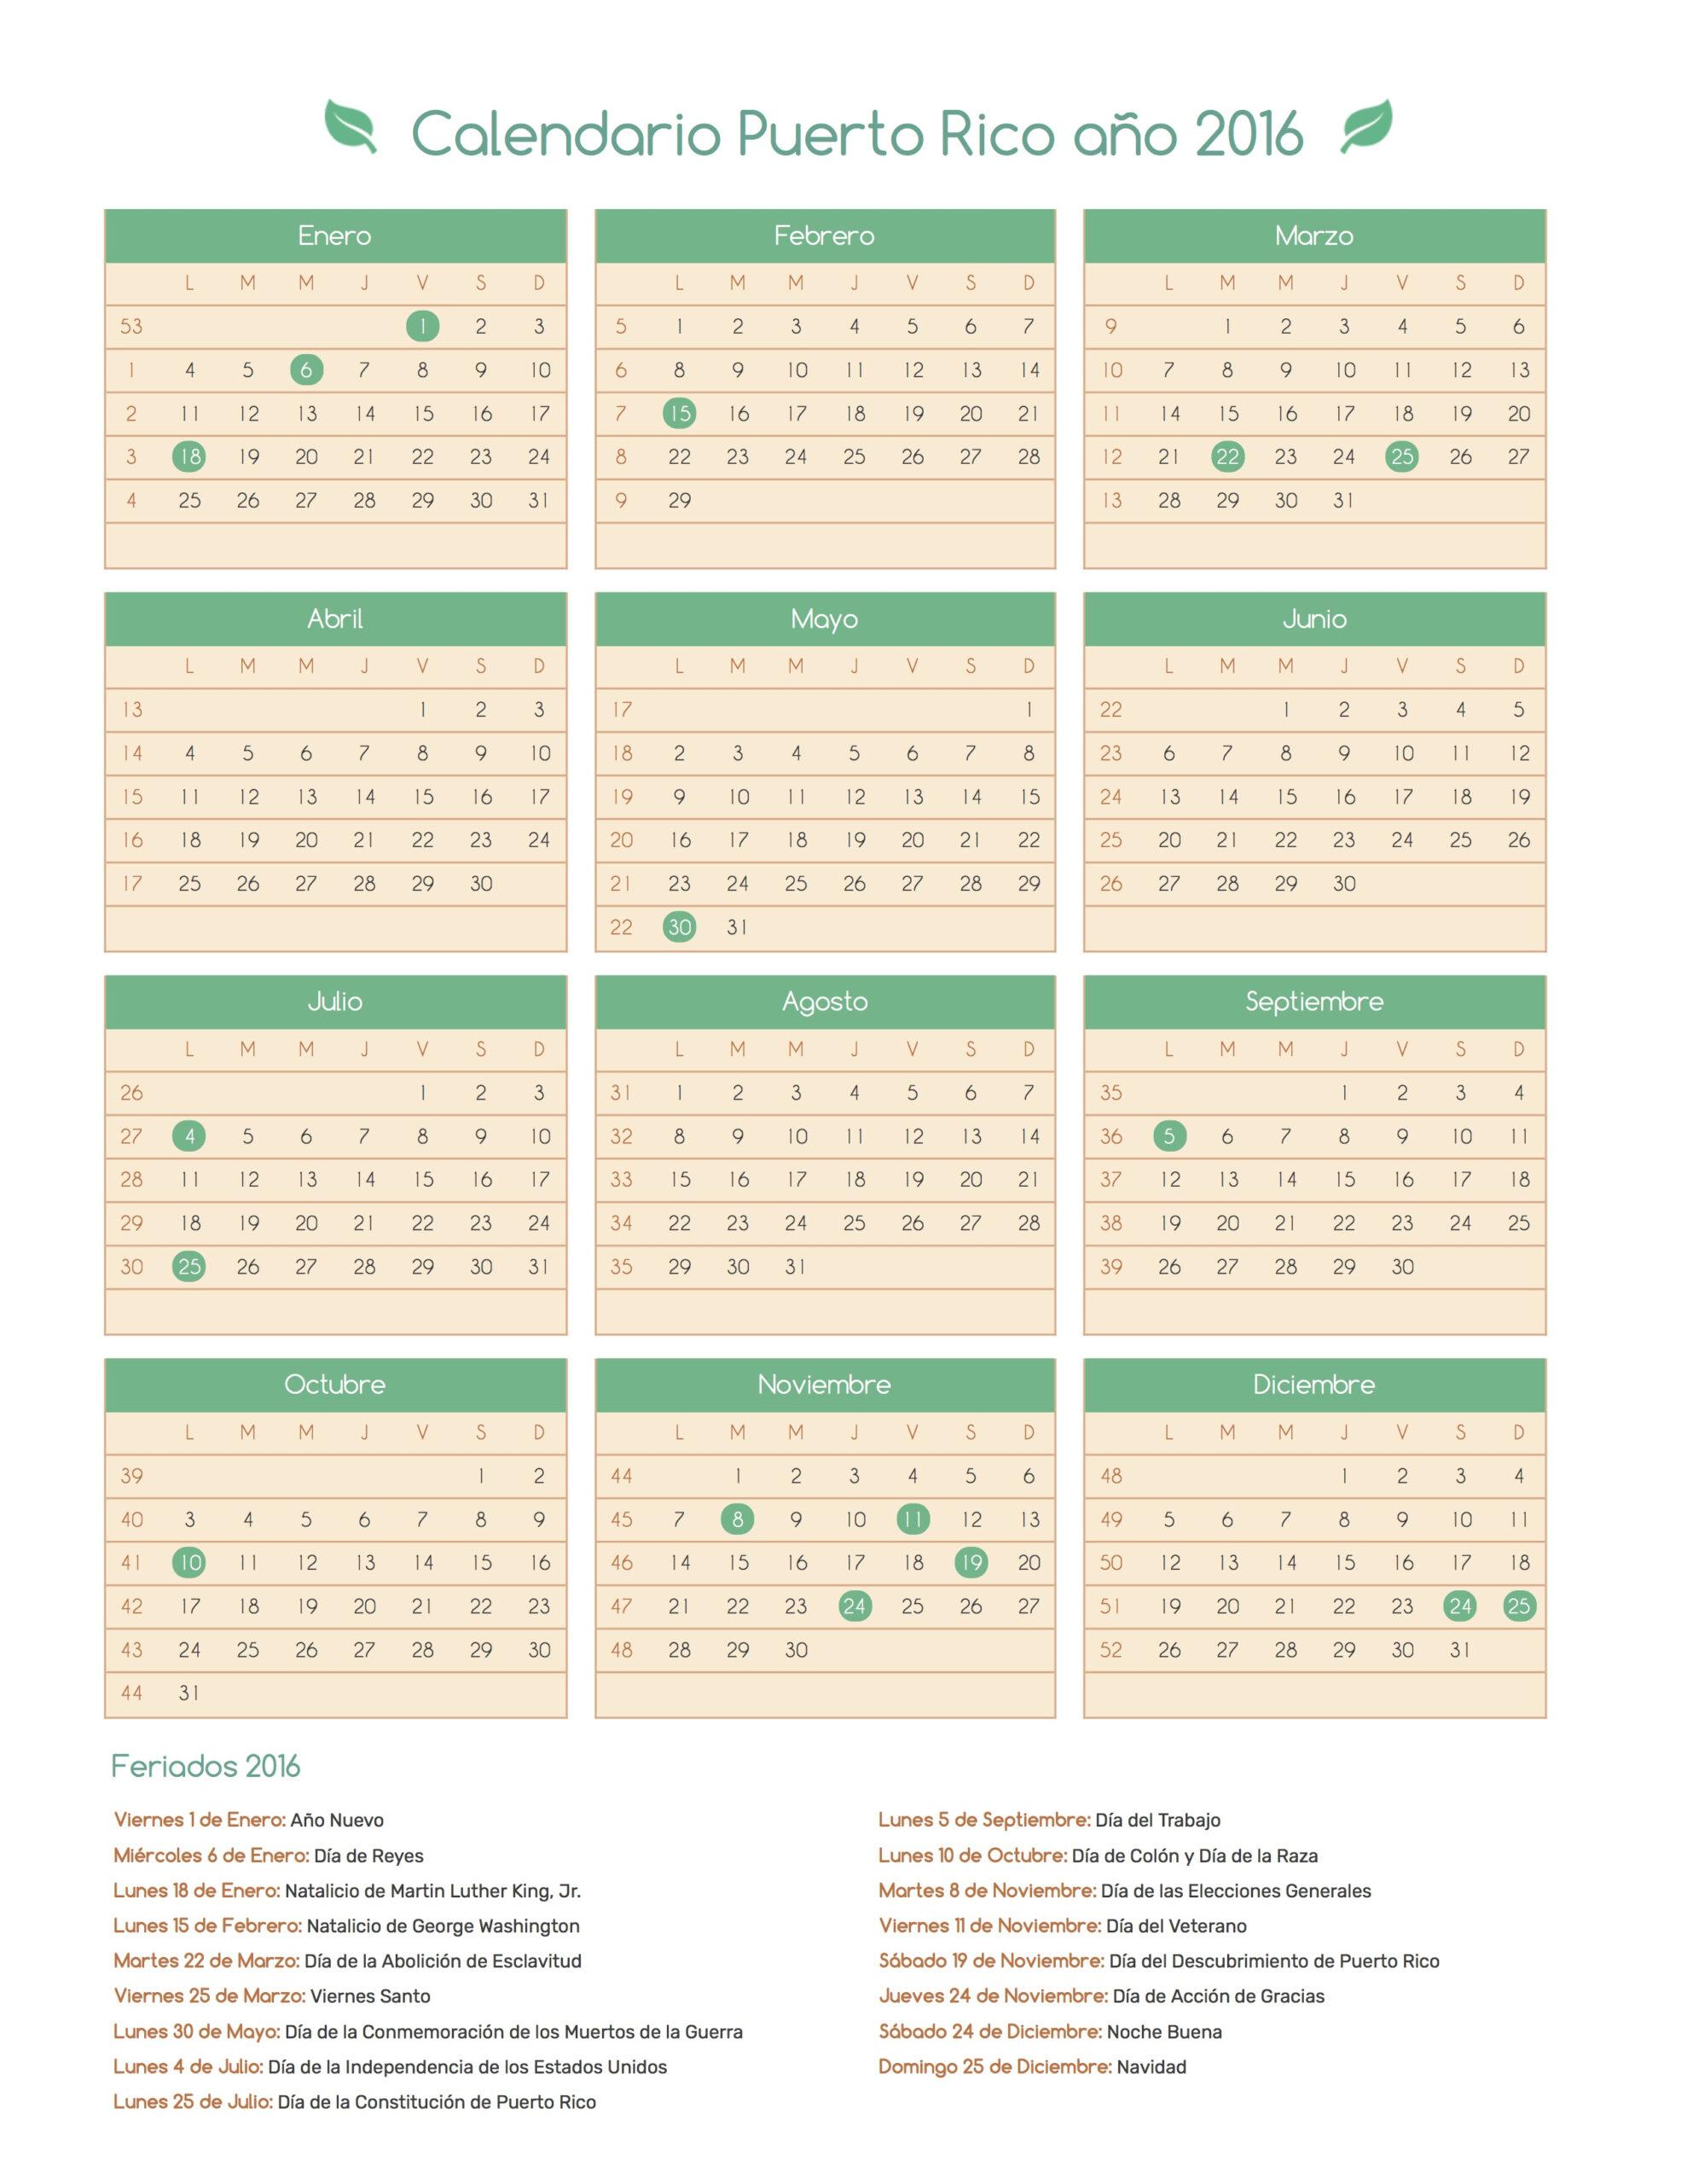 Calendario Puerto Rico Año 2016 | Feriados regarding Lunar Calendar Puerto Rico